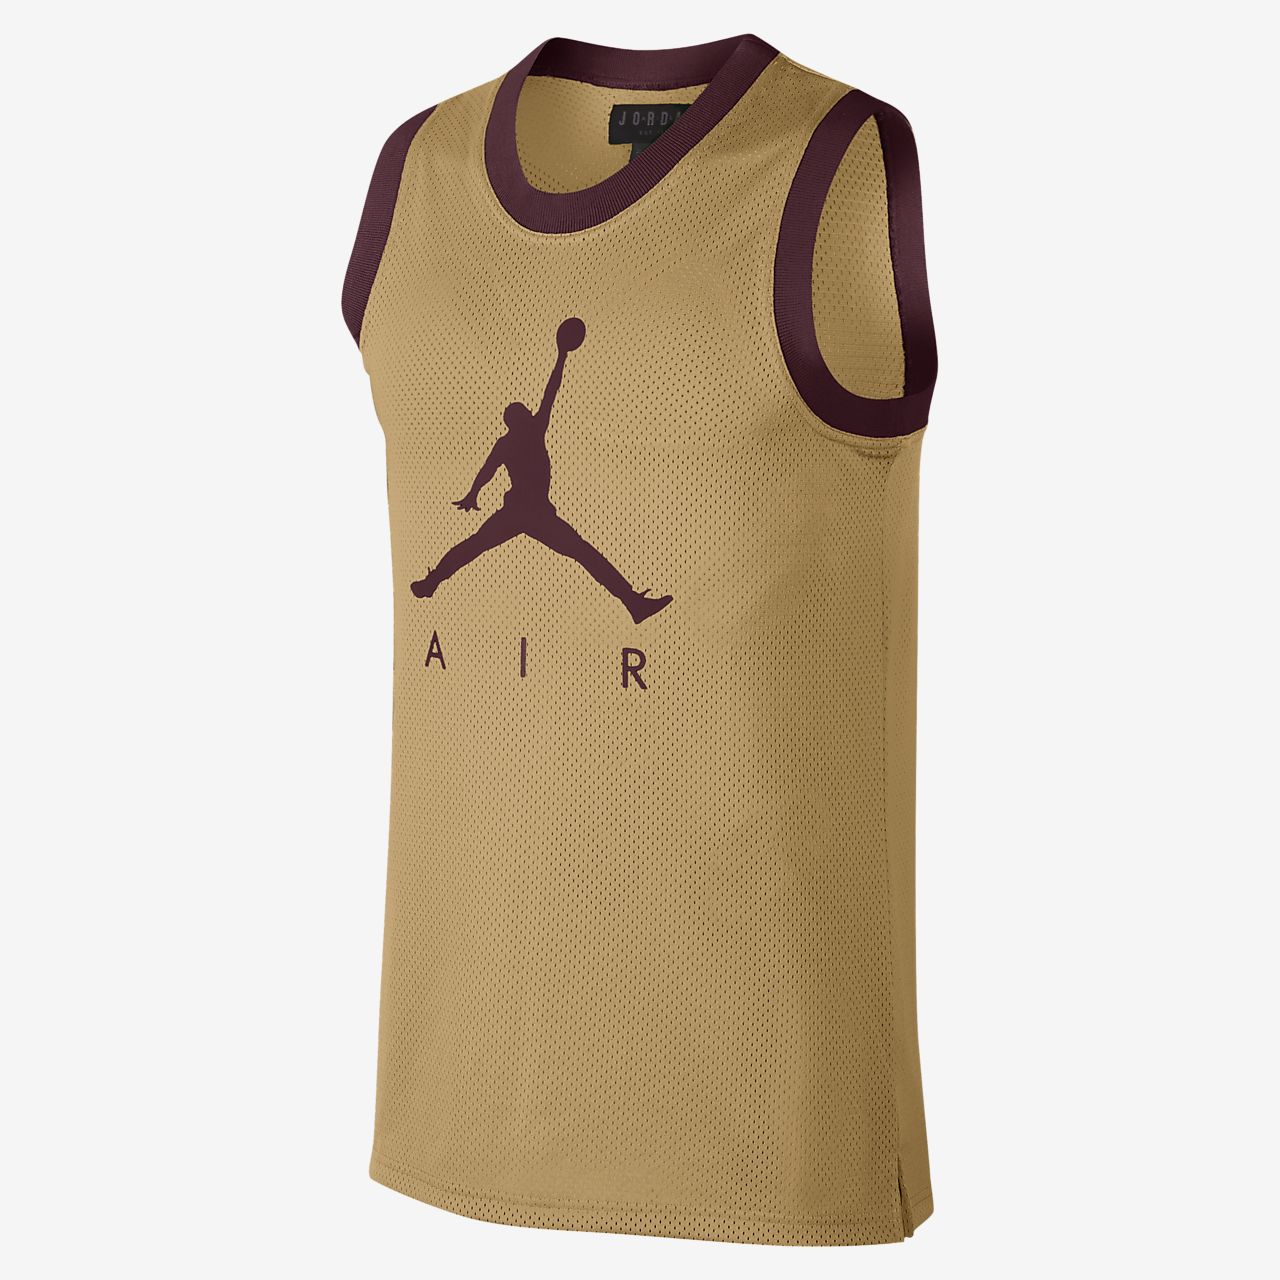 Jordan Jumpman Air Mesh Men's Basketball Jersey